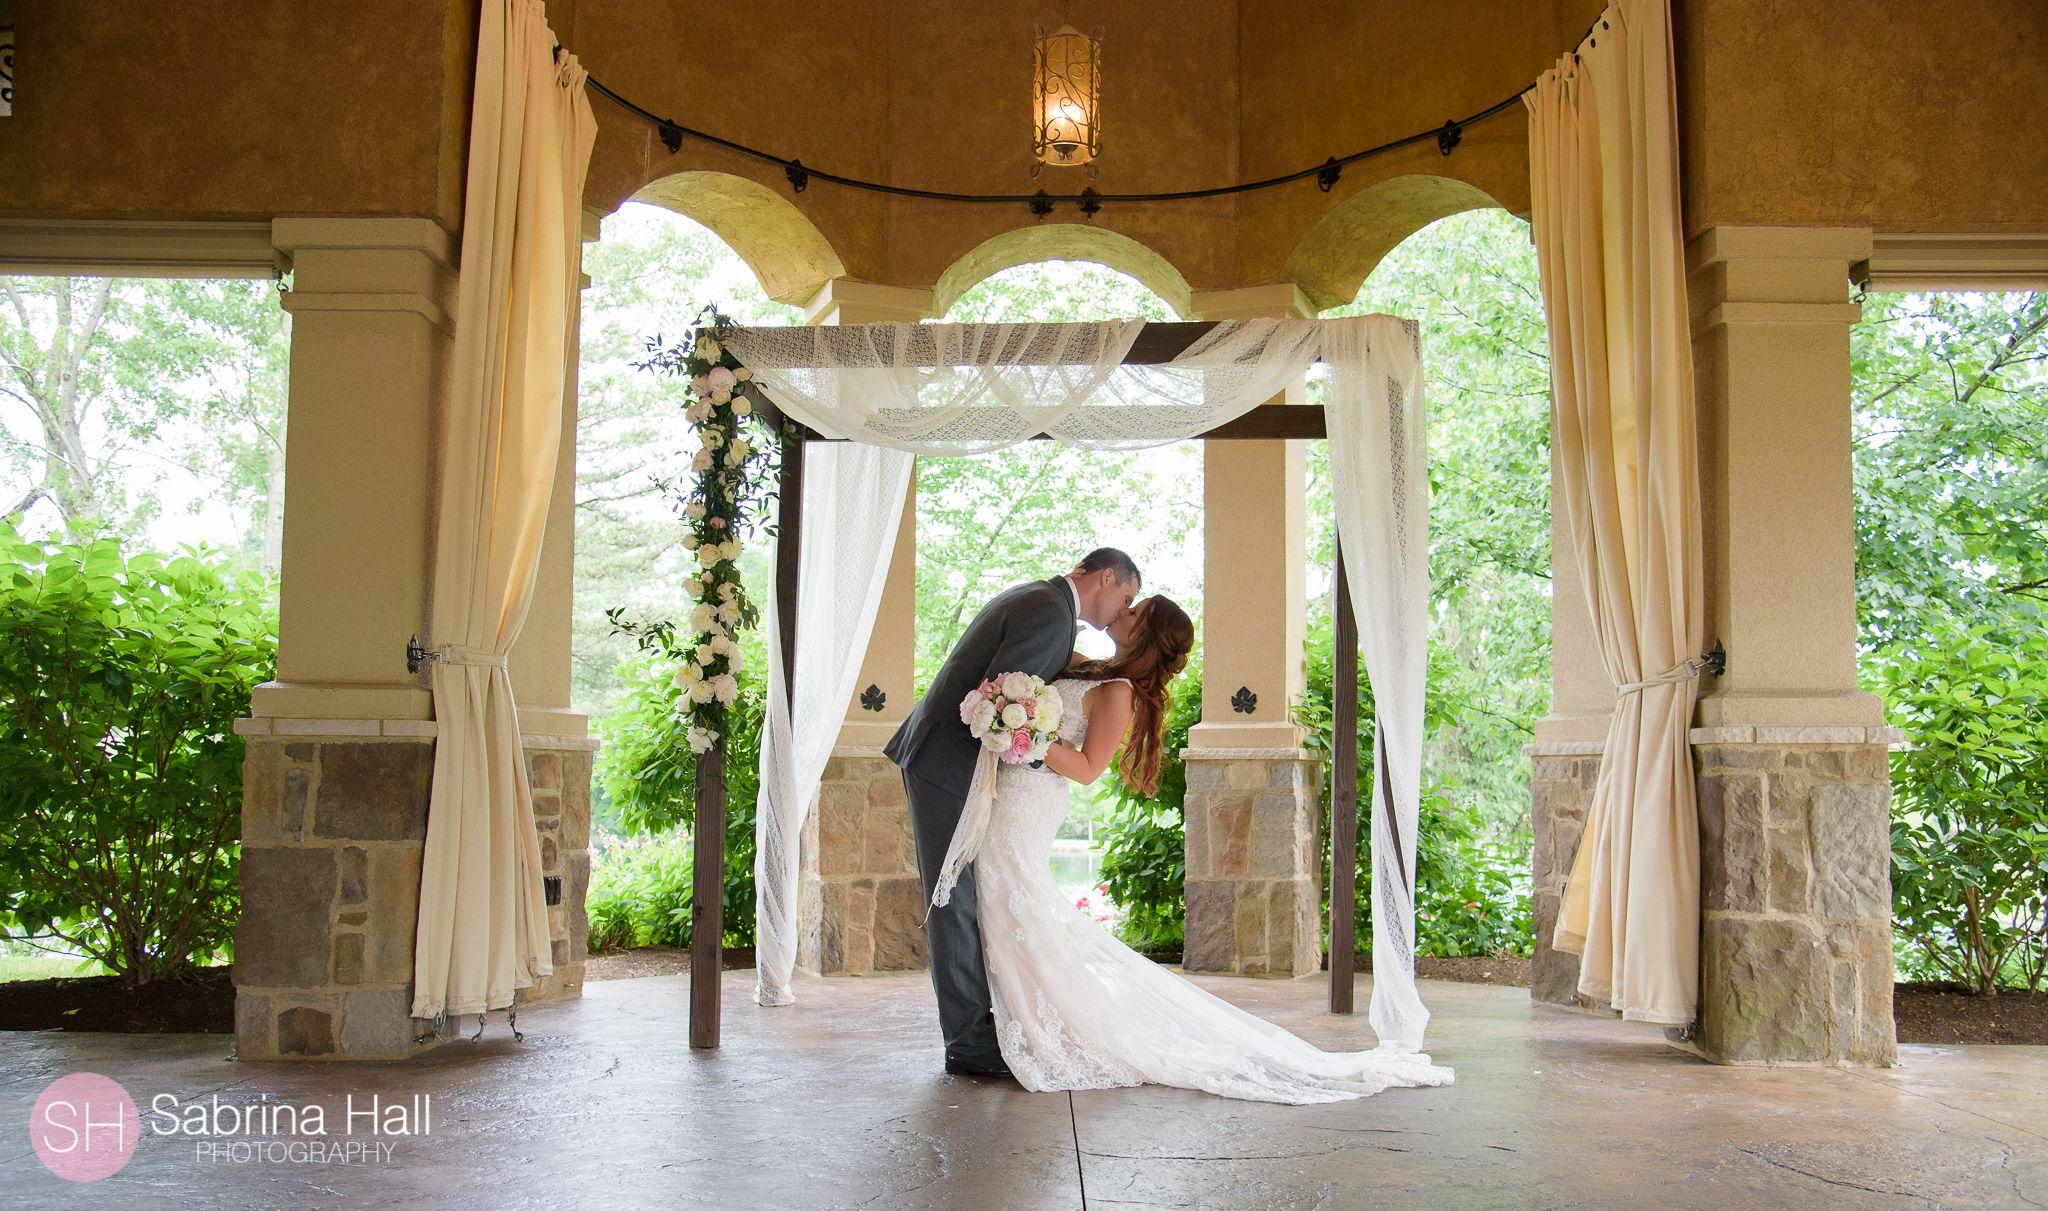 Gervasi Winery Natural Photoshoot Ideas Vineyard Wedding Wedding Wedding Entertainment